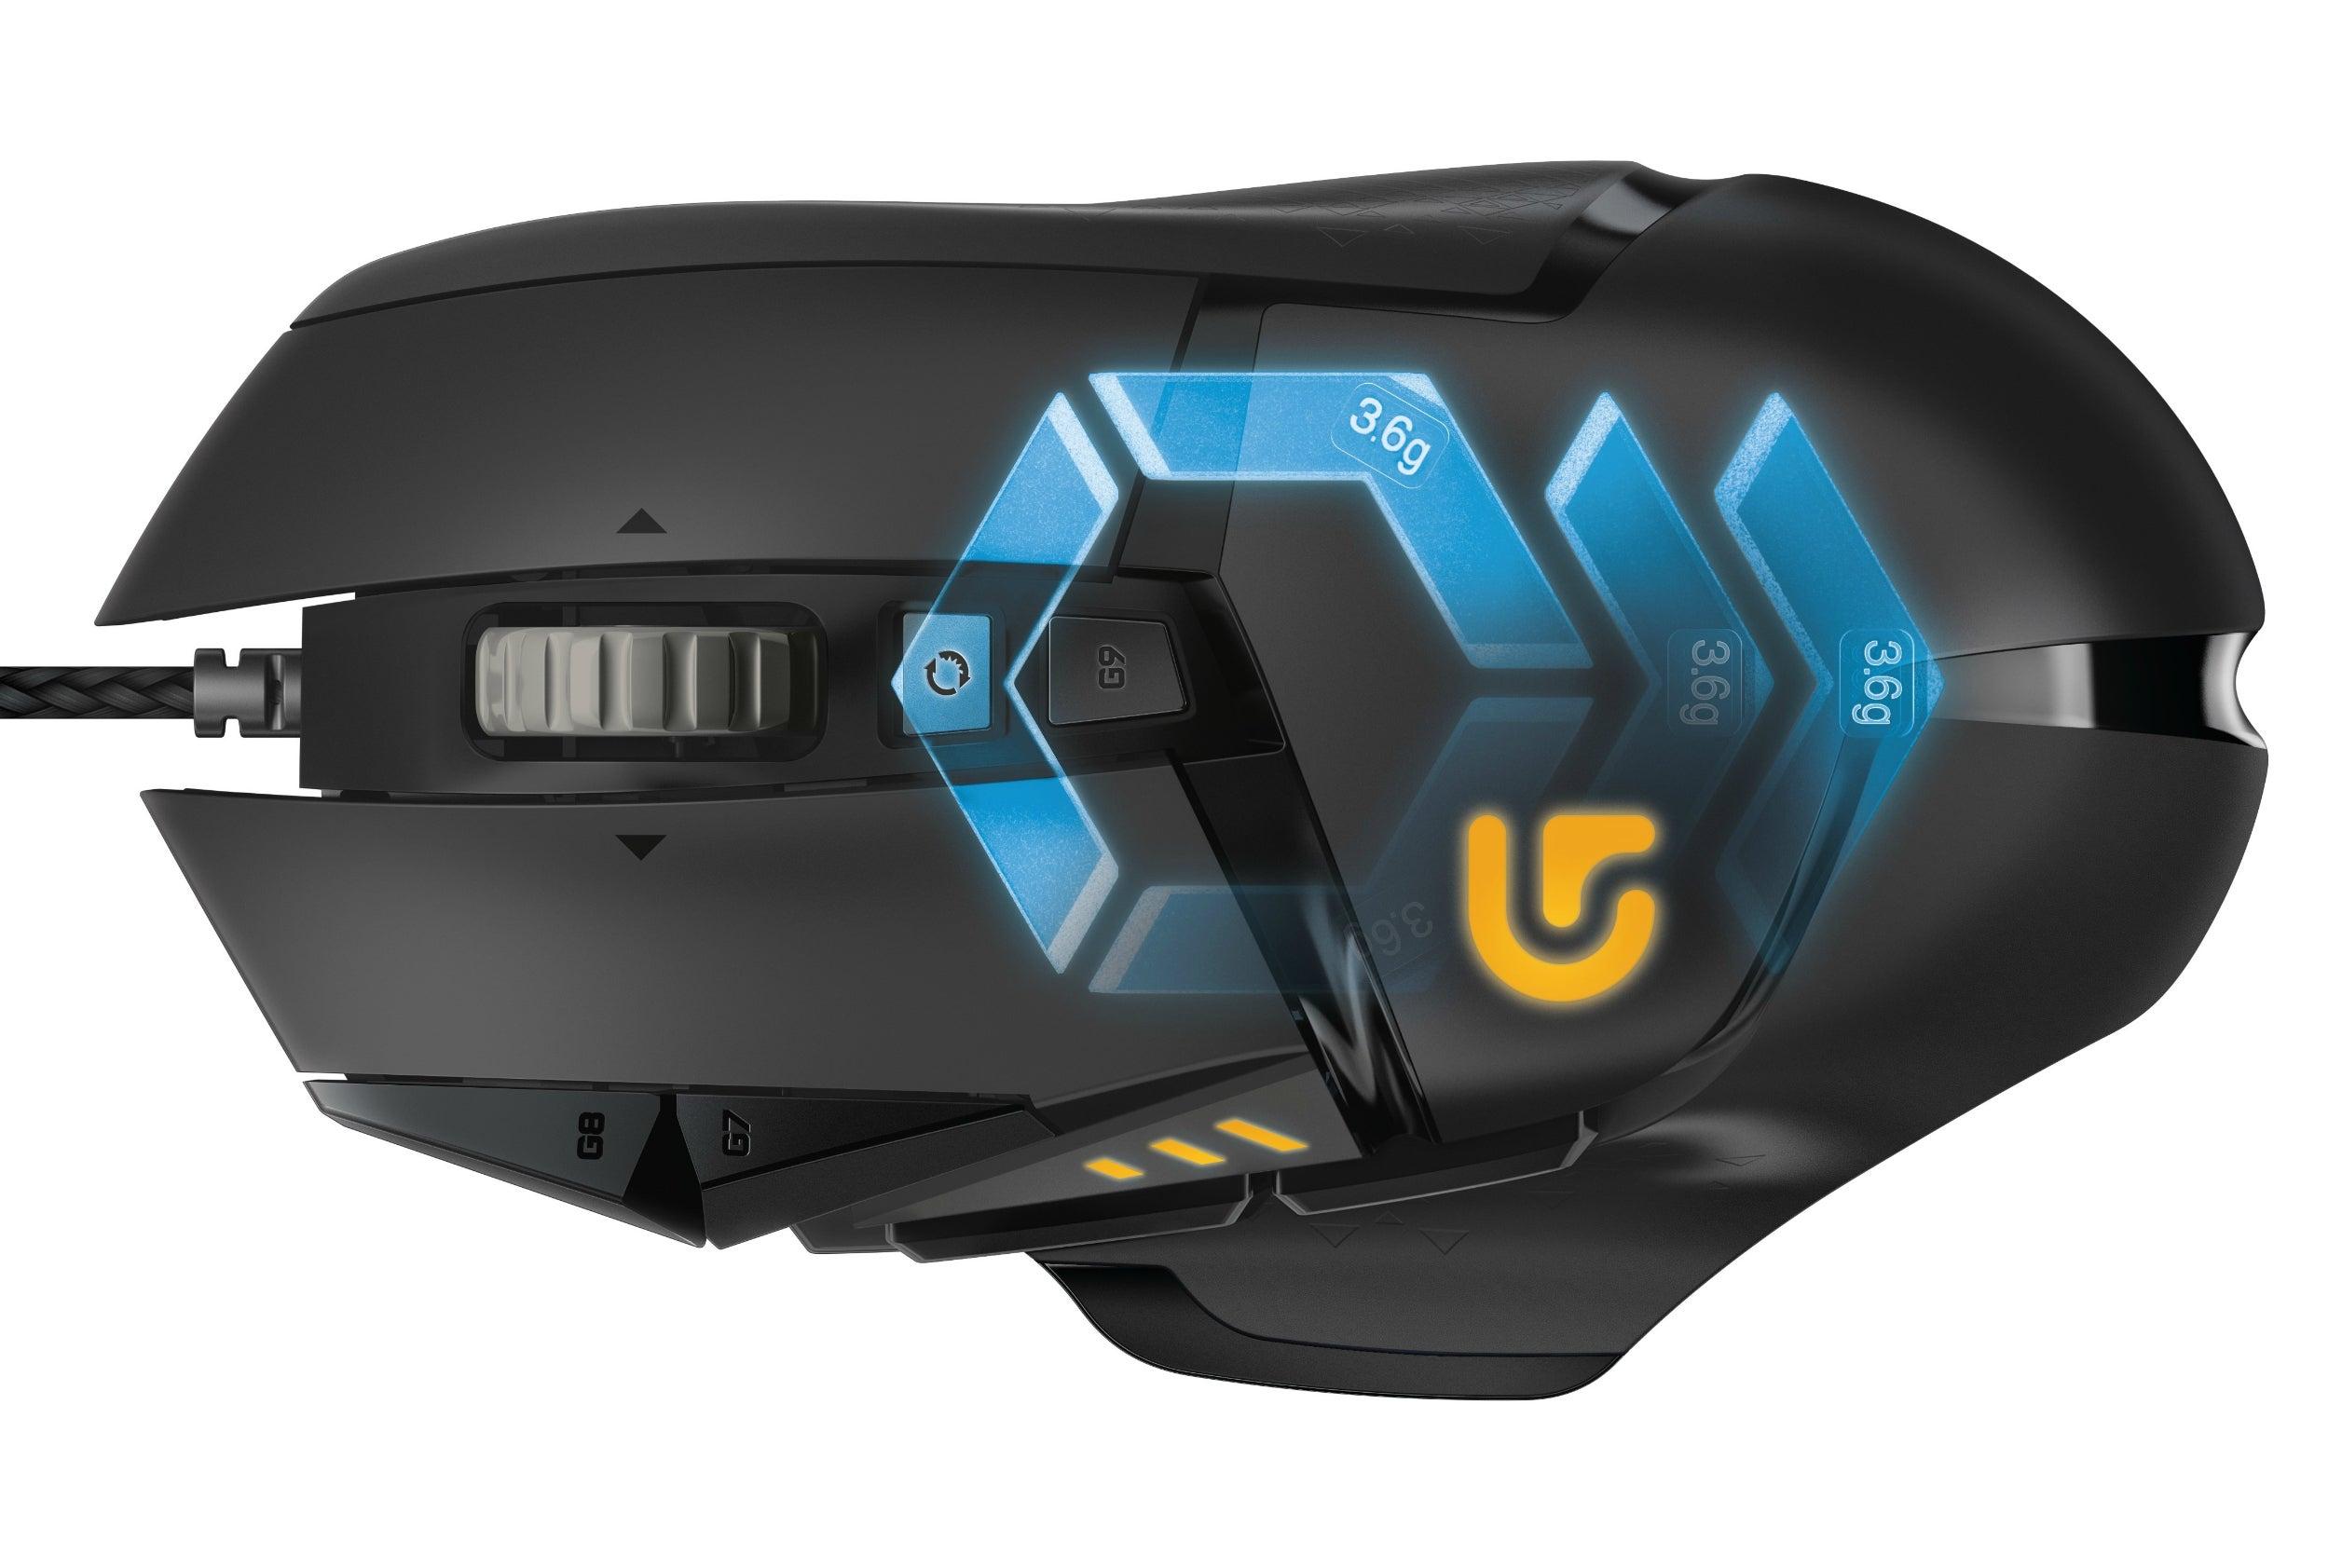 982c969756d Logitech overhauls the excellent G502 Proteus Core mouse with RGB lighting